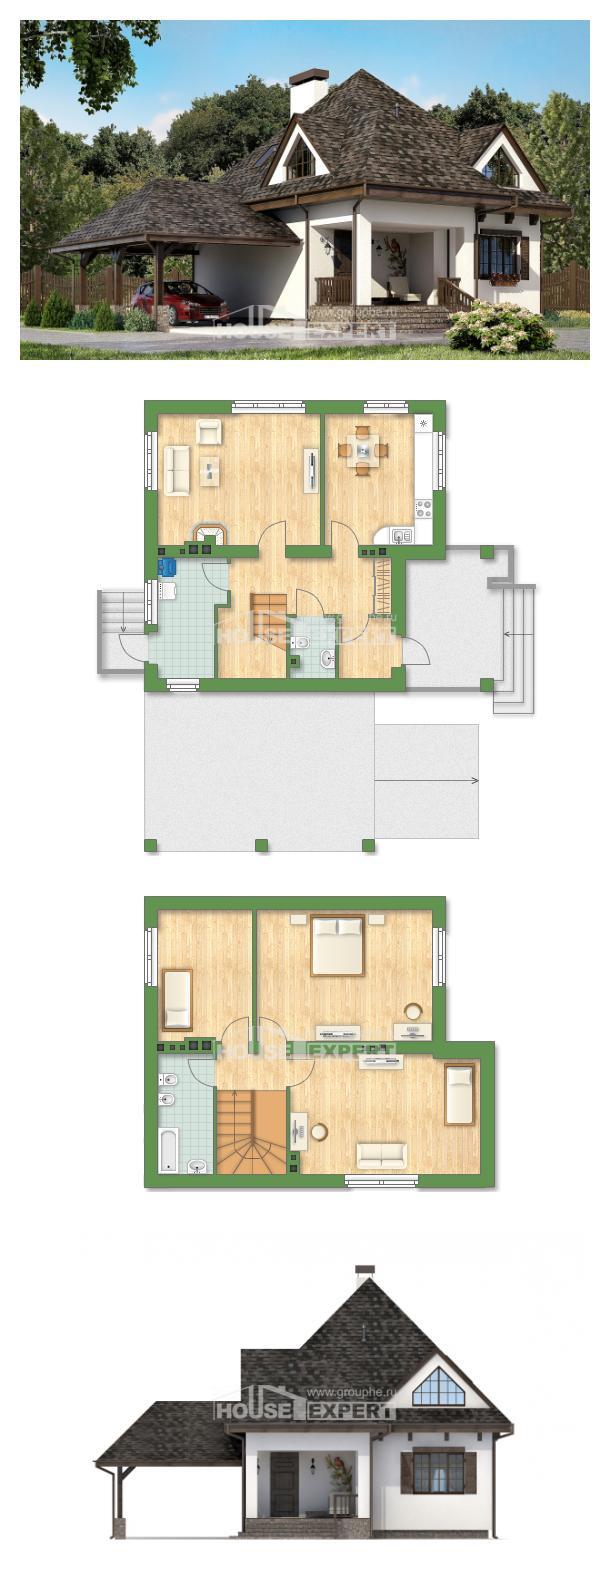 Проект дома 110-002-Л | House Expert